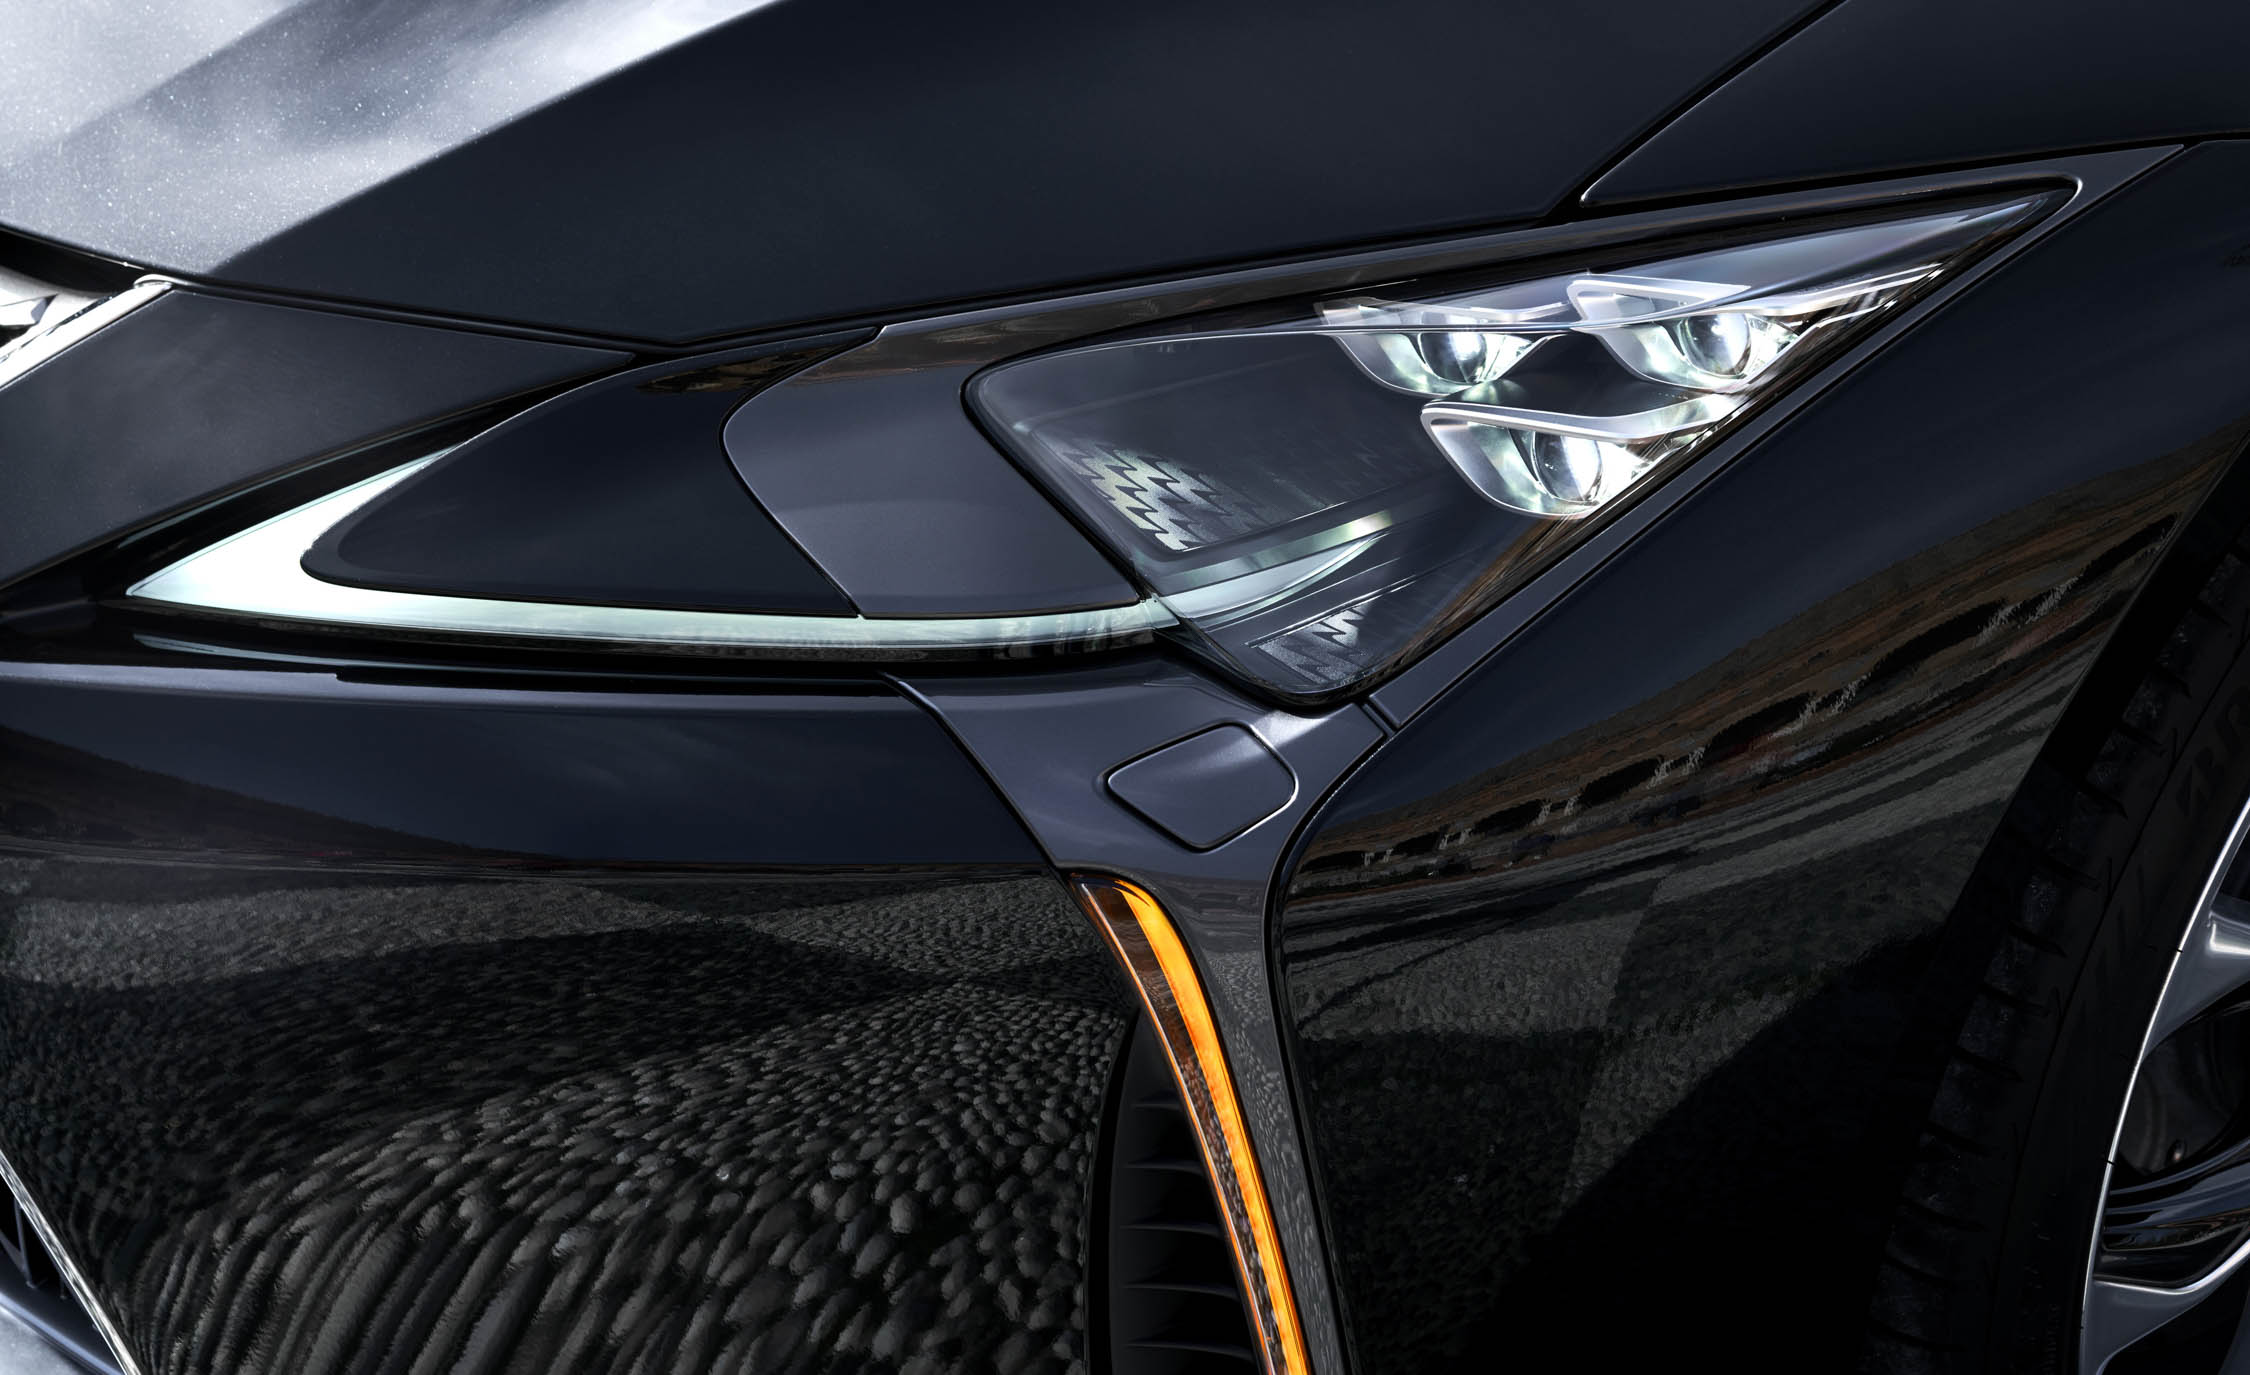 2018 Lexus Lc 500h Exterior View Headlight (Photo 51 of 84)